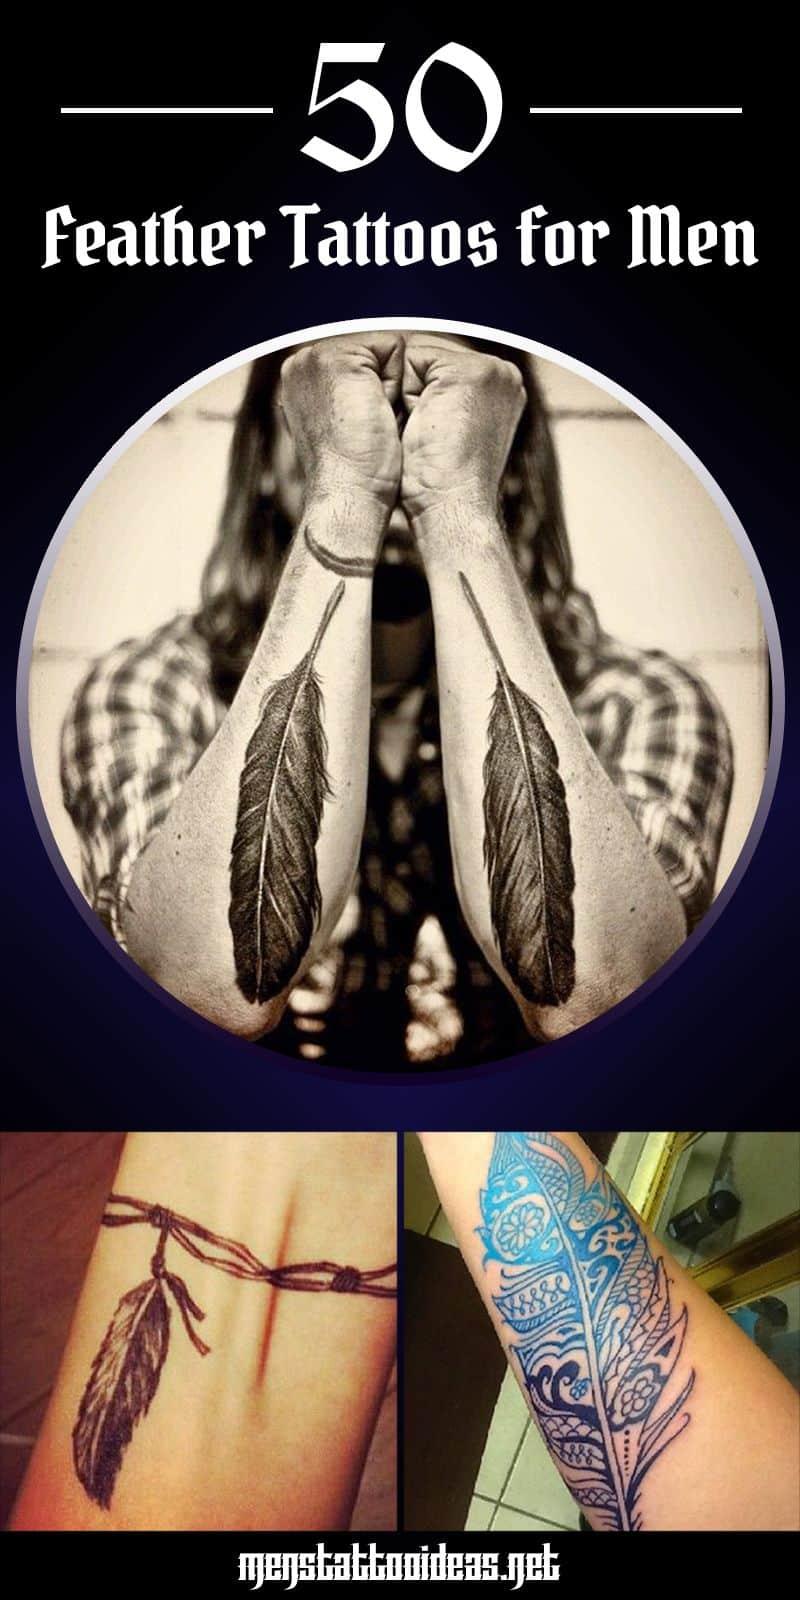 Feather tattoo ideas